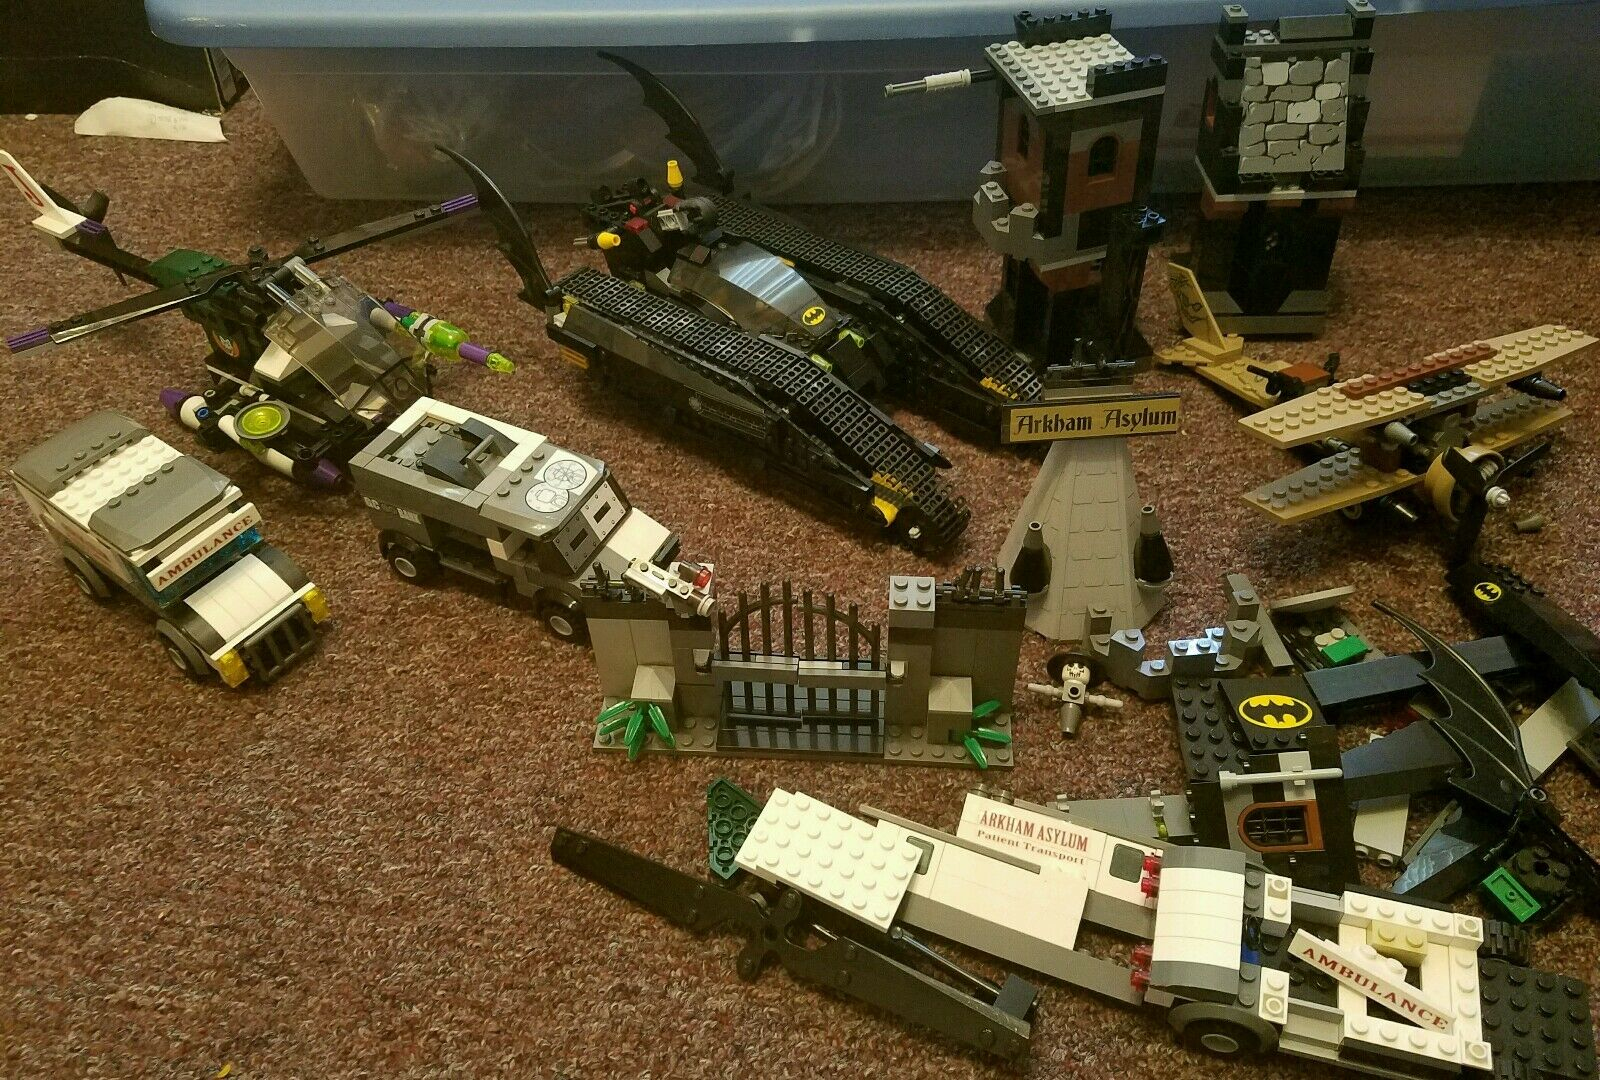 LEGO BAThomme 7787 BAT  TANK, Joker Helicopter, Svoitureecrow  Almost complete plus mor  shopping en ligne